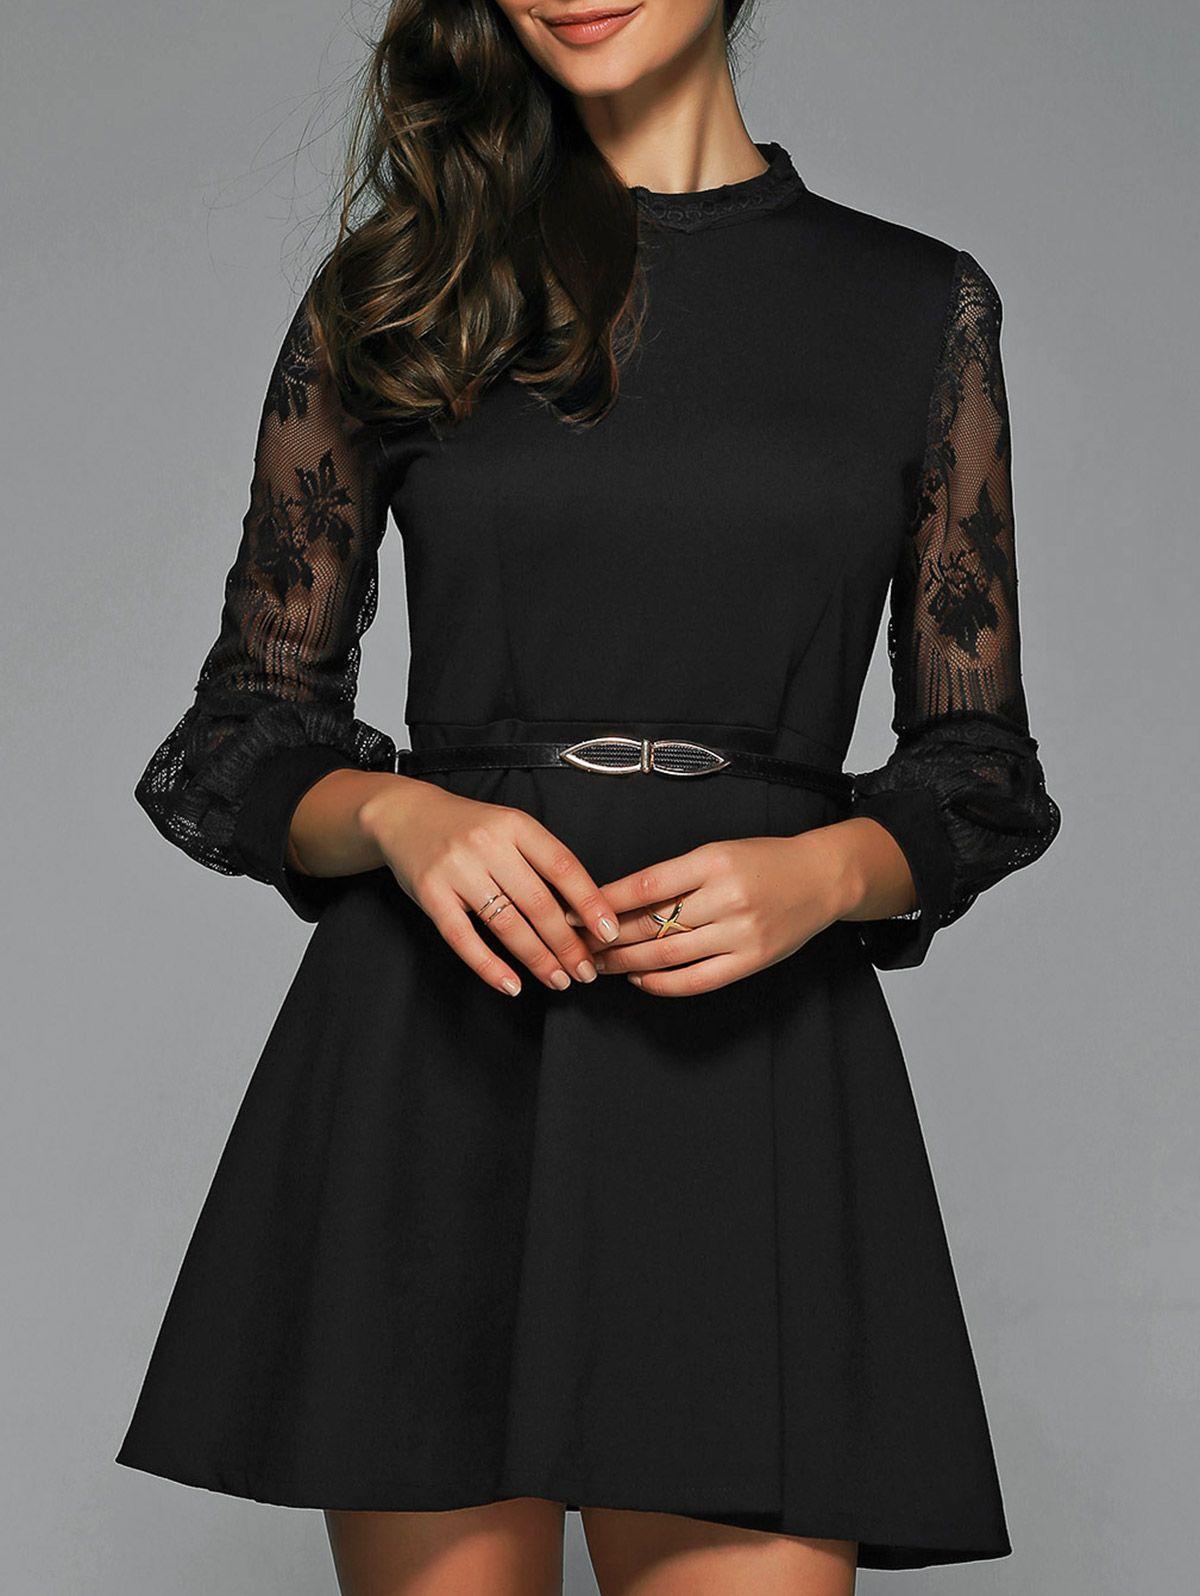 A Line Sheer Little Black Dress With Belt Lbd Fashion Party Dresses Black Dresses Black Lace Fashion Latest Casual Dress Business Casual Dresses [ 1596 x 1200 Pixel ]